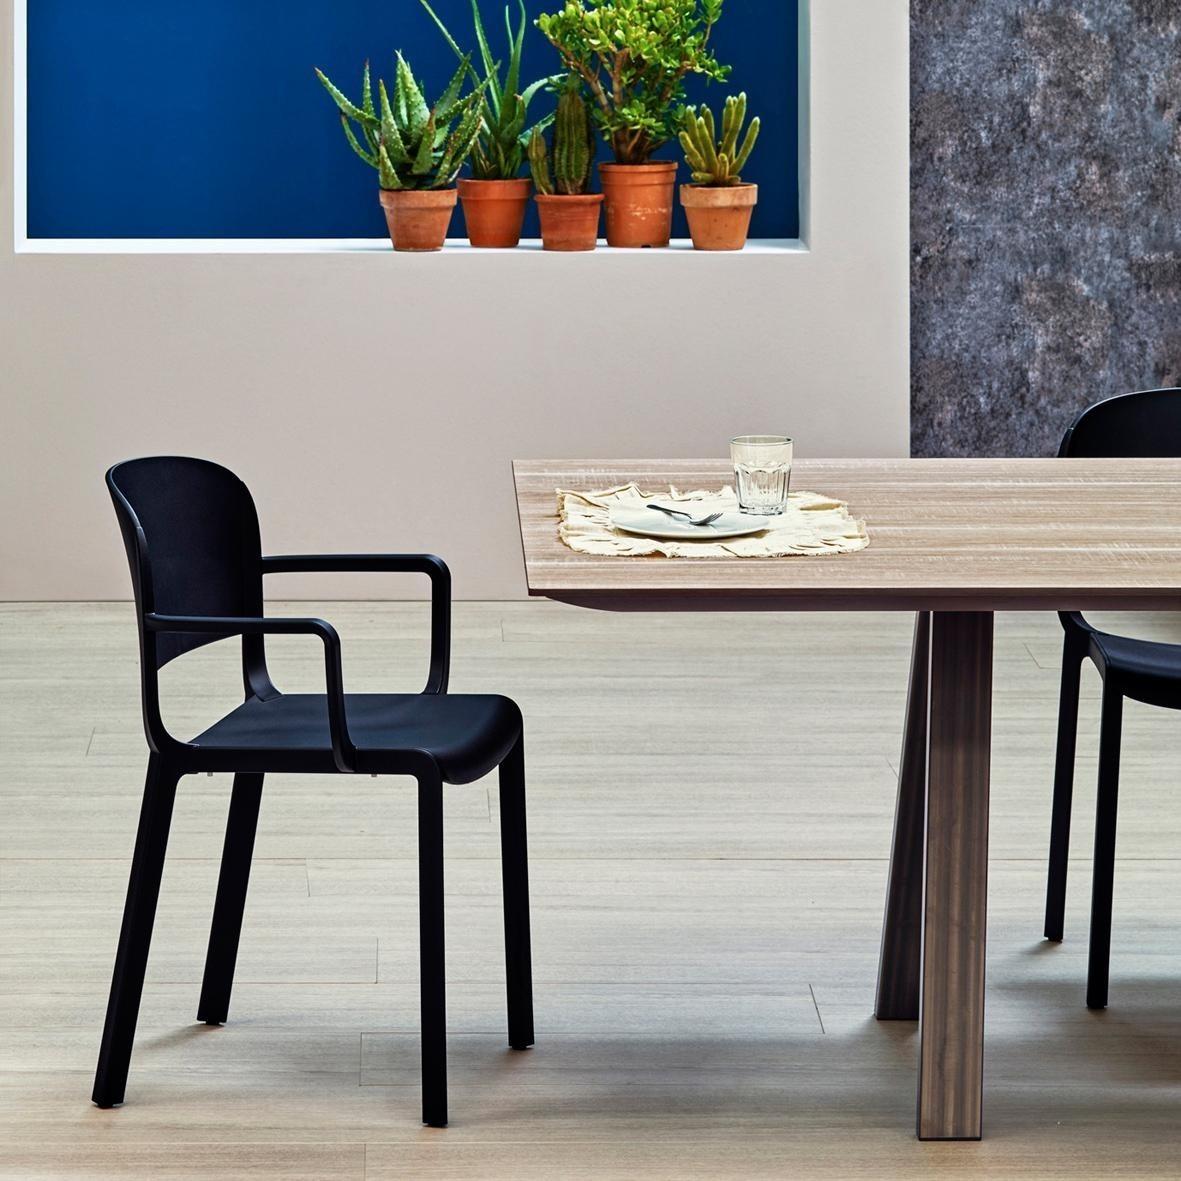 pedrali dome 265 garden armchair ambientedirect rh ambientedirect com